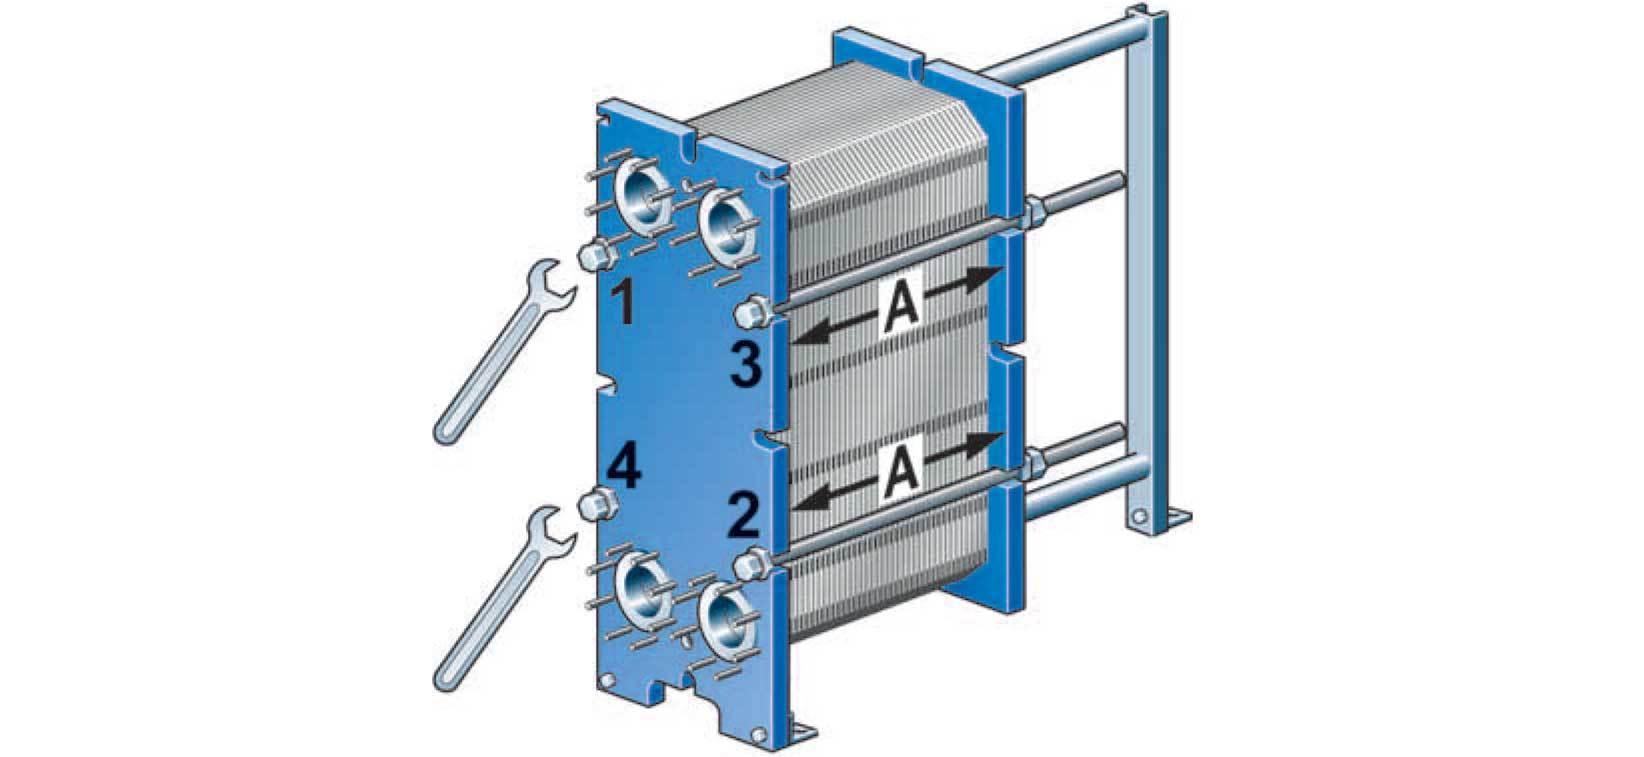 Heat Exchanger Illustration